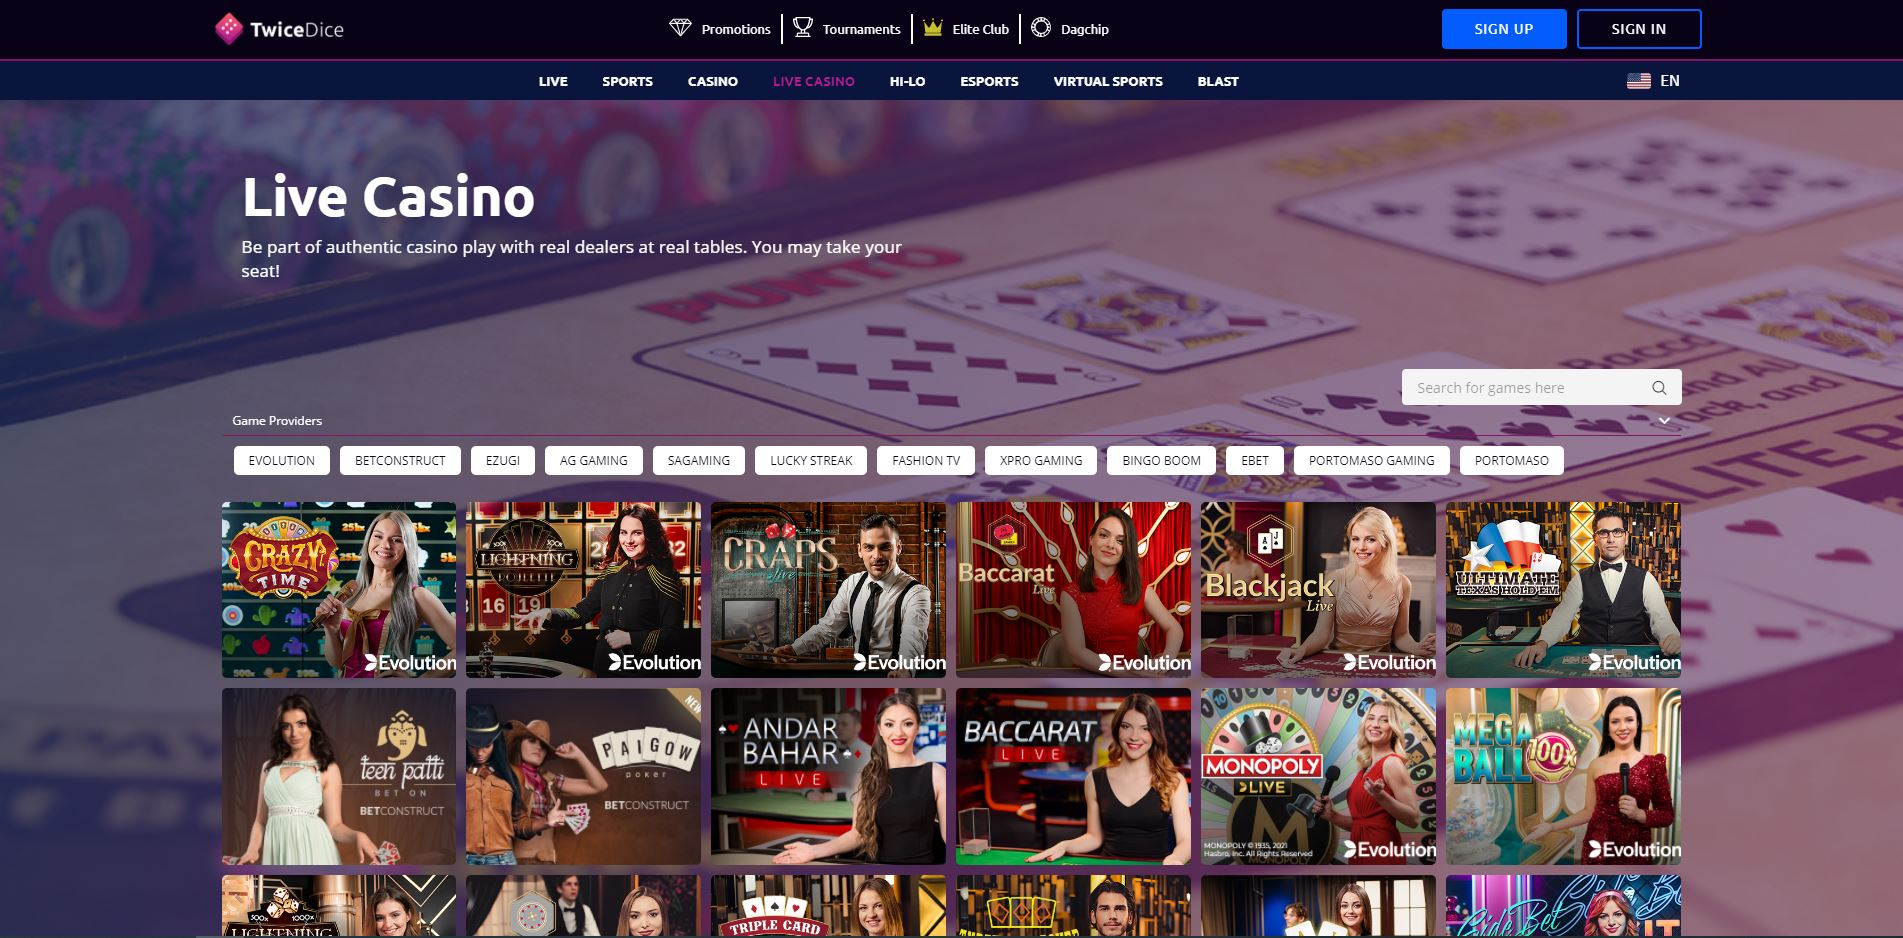 TwiceDice Live Casino Screenshot